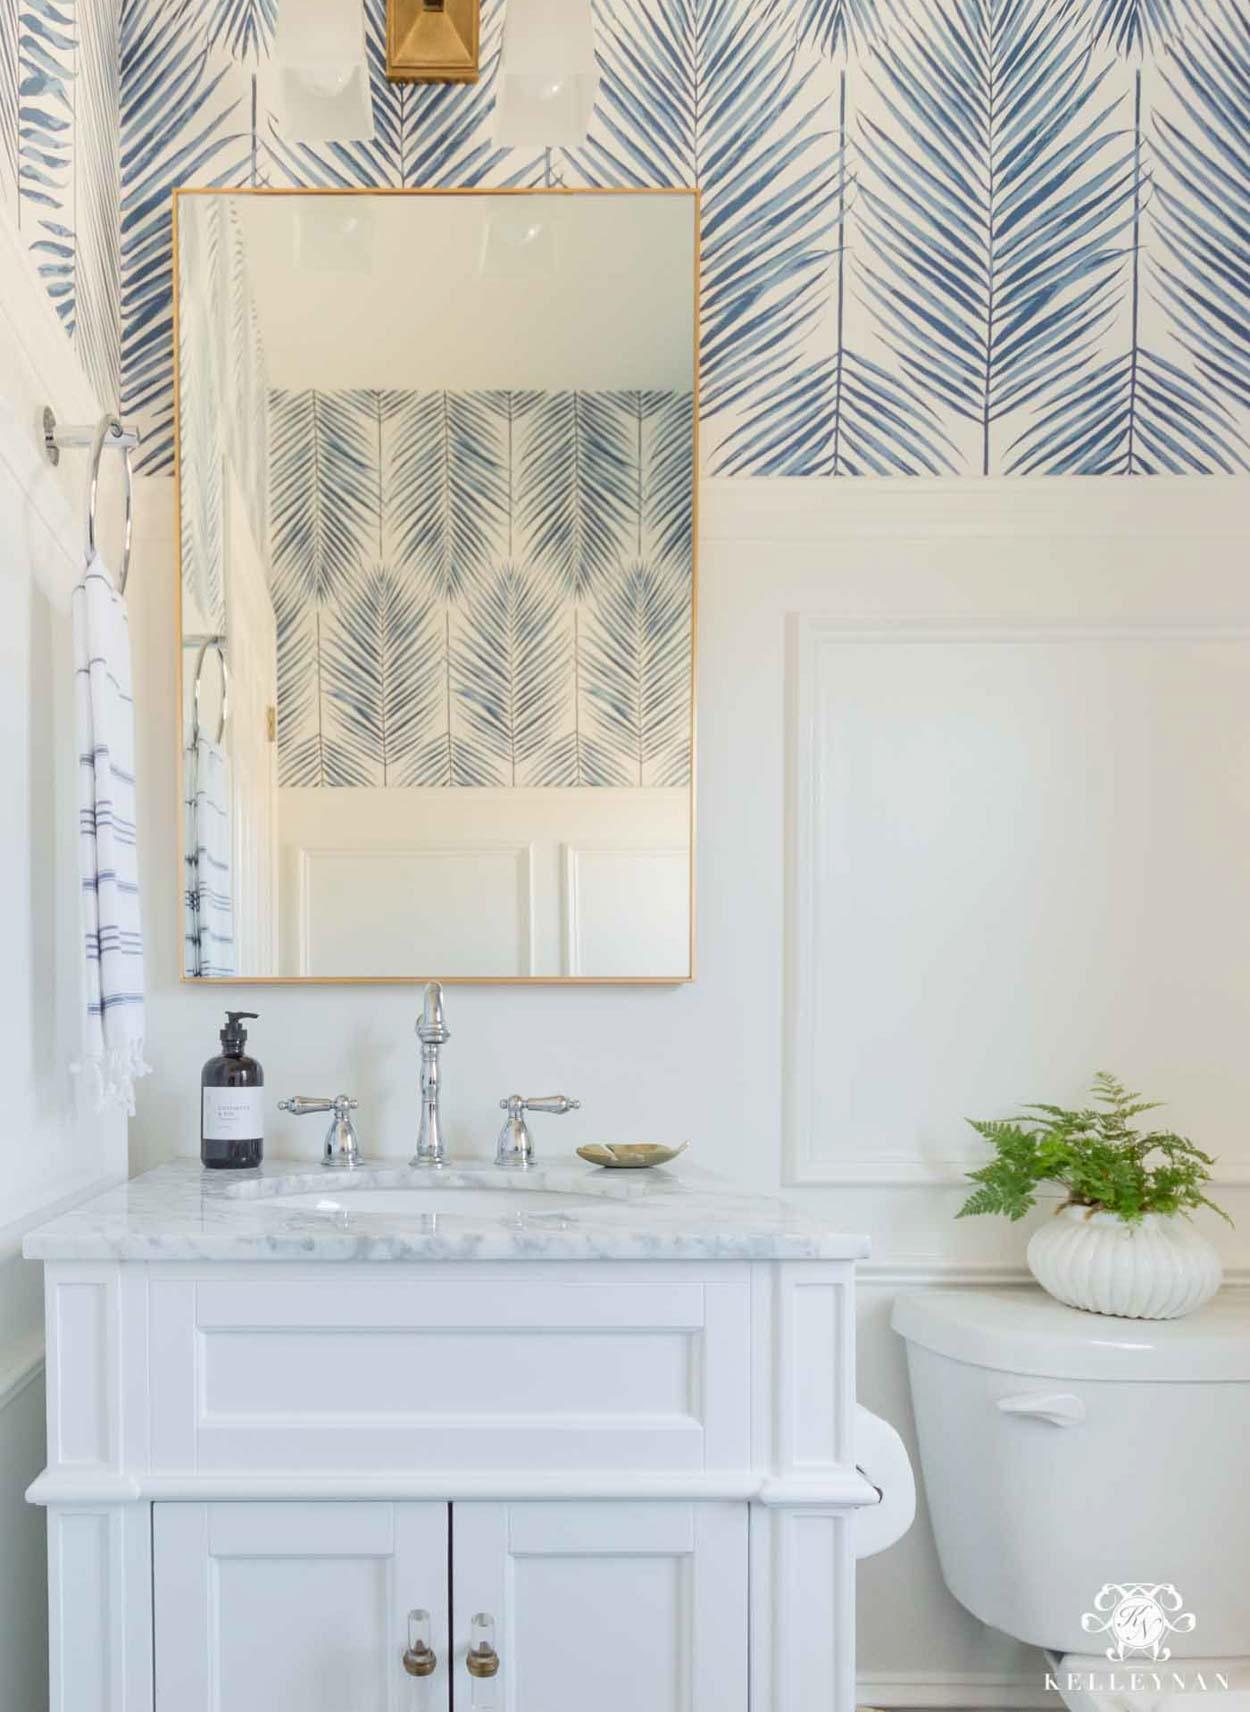 16 Small Bathroom Vanities 24 Inches Under Kelley Nan